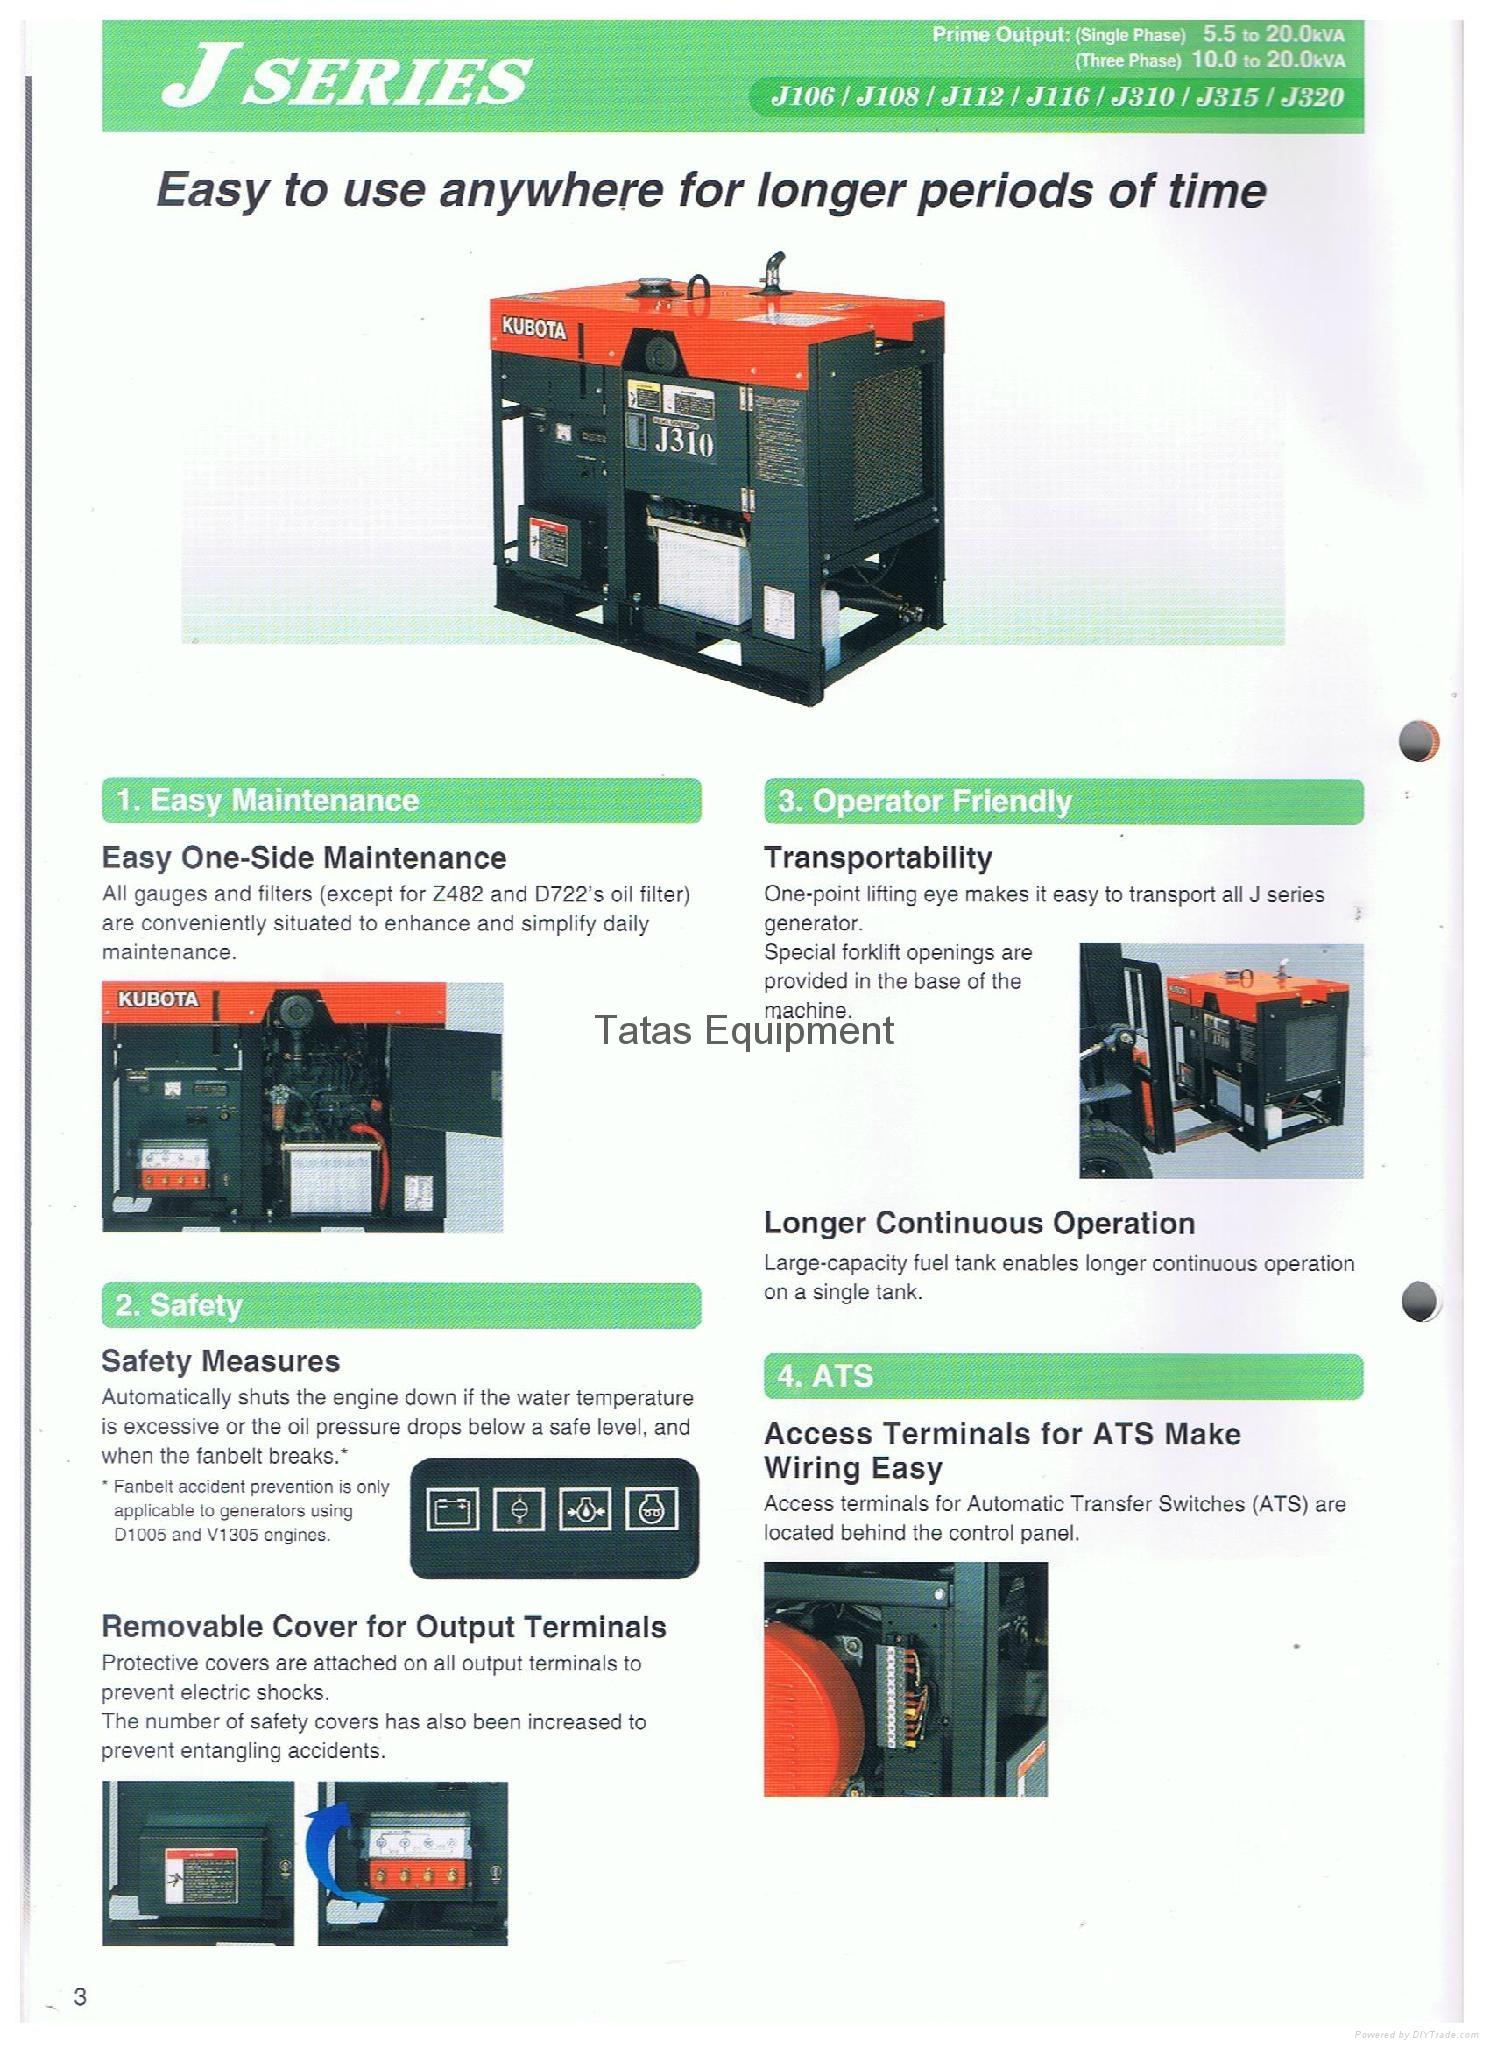 Kubota Diesel Generator J Series 2 Pole Single and Three Phase